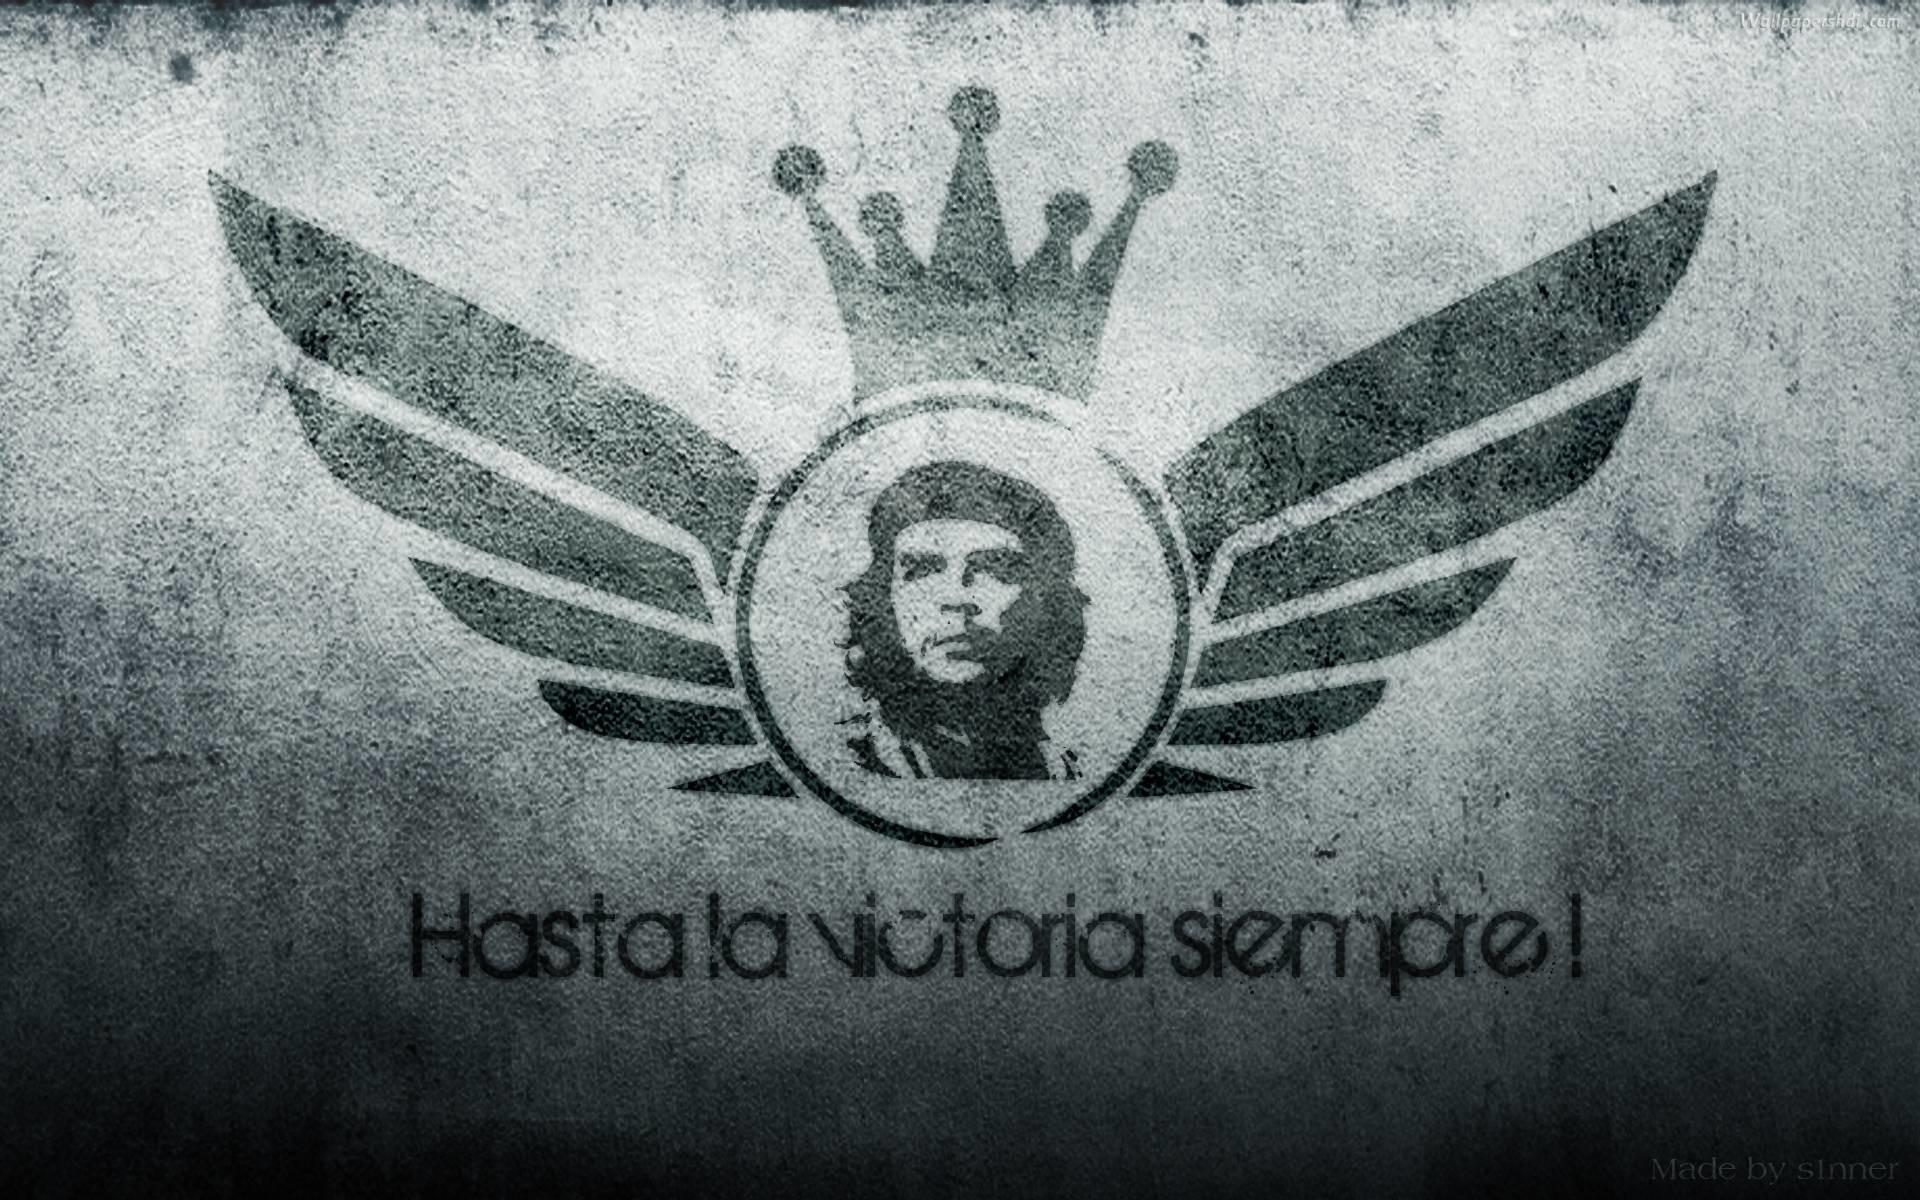 Che Guevara Wallpapers – Full HD wallpaper search